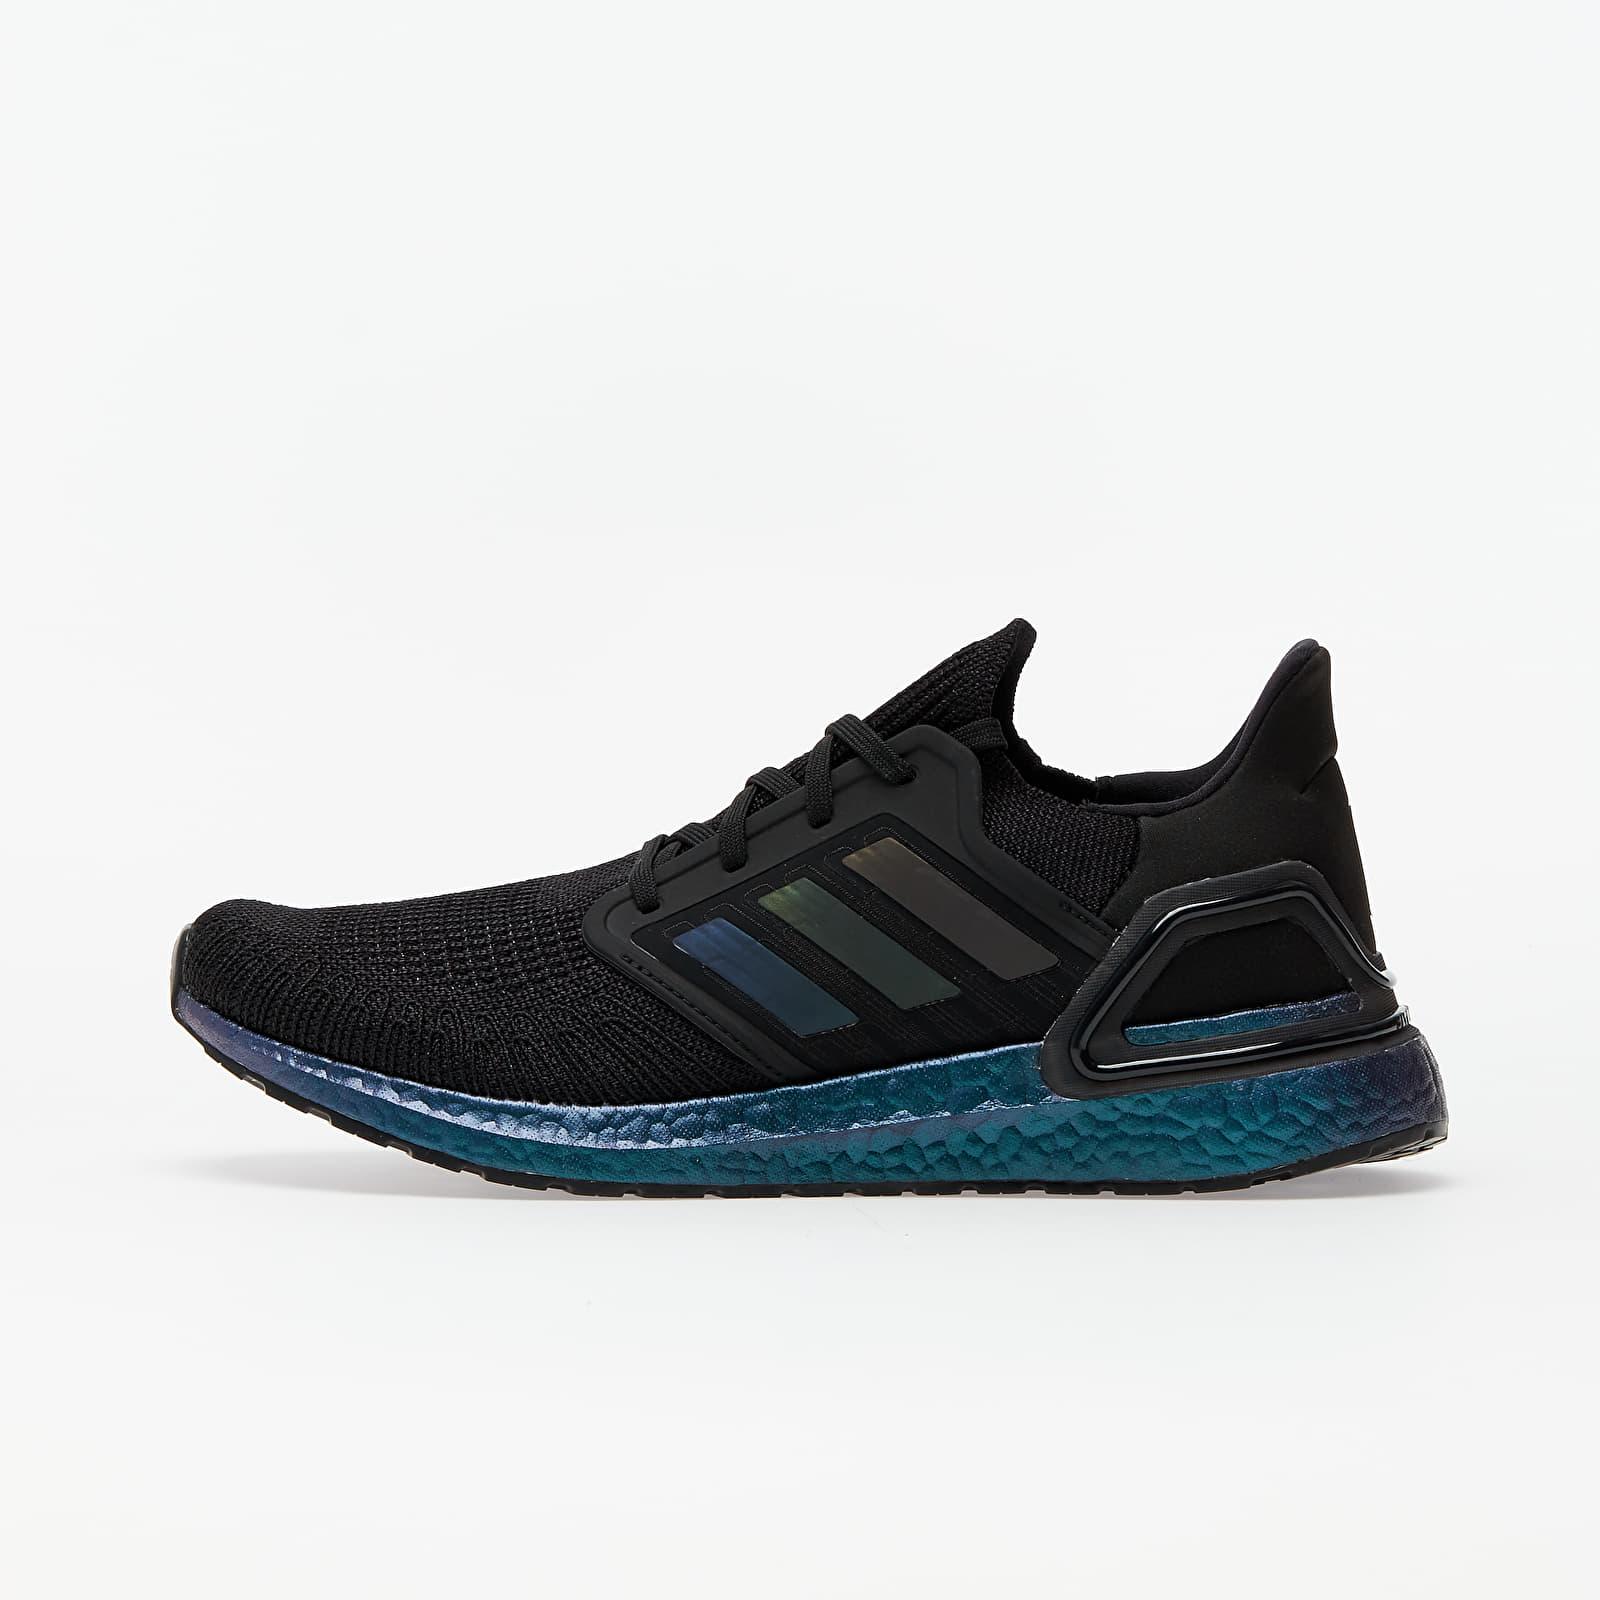 Men's shoes adidas UltraBOOST 20 Core Black/ Core Black/ Signature Cyan